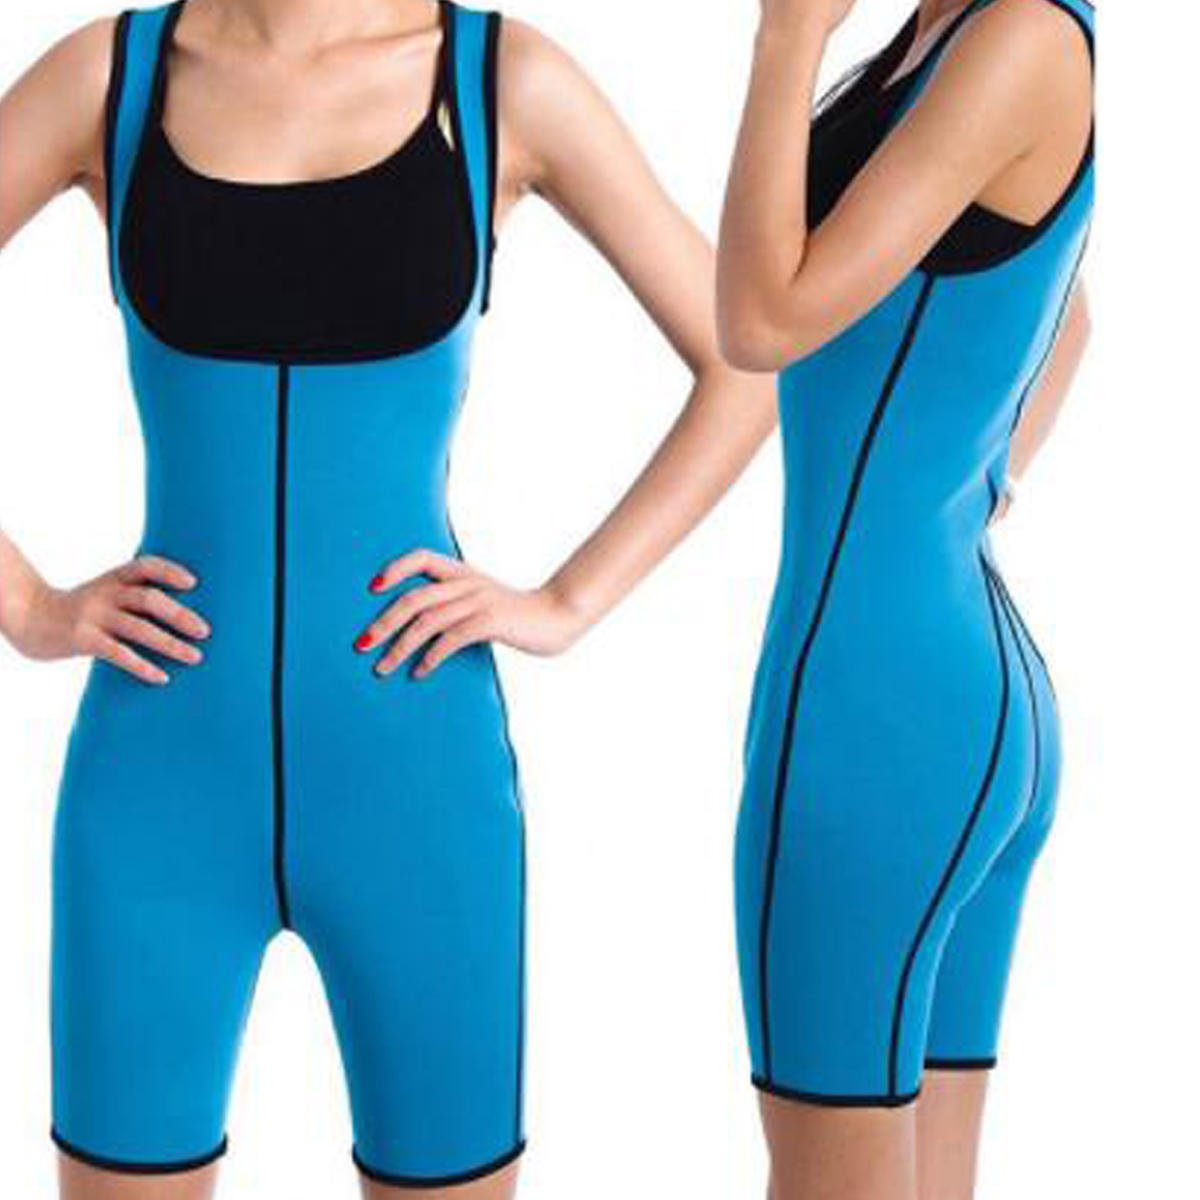 c94fef477bb Womens Shapewear Full Body Sweat Shaper Fitness Gym Sport Slimming Keep Fit Sauna  Suit Vest